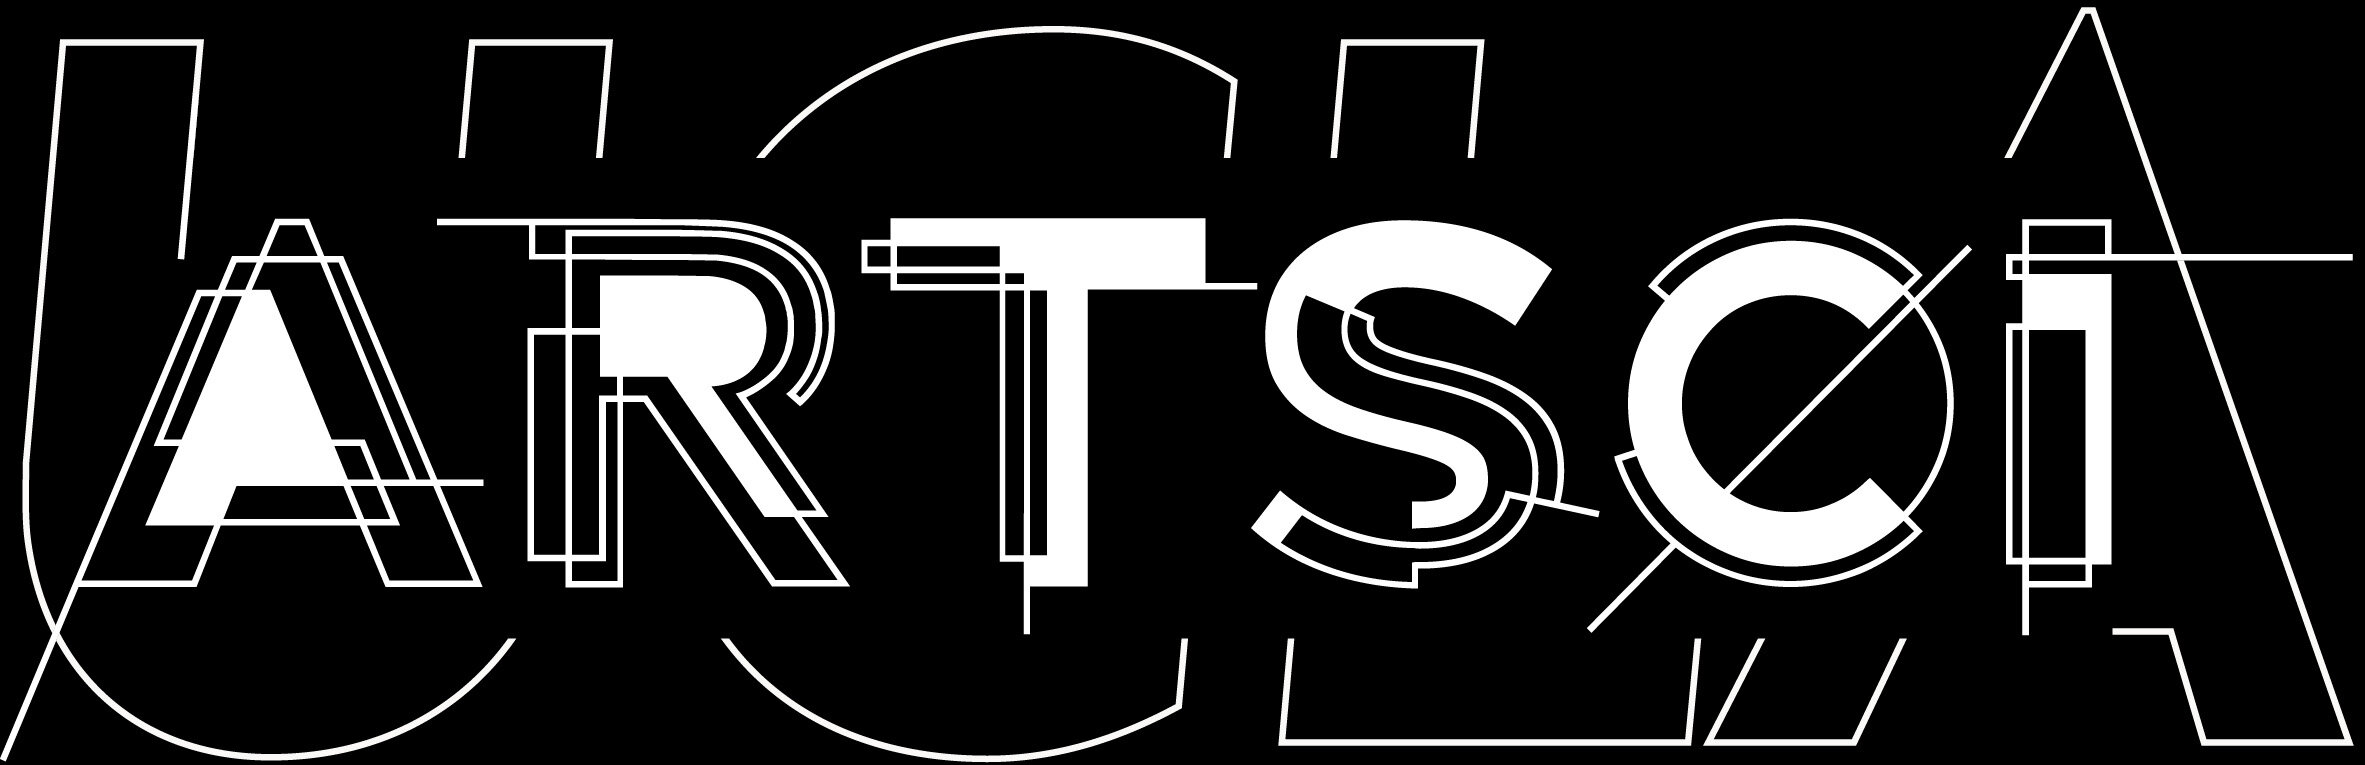 artsci_logo_BW.jpg